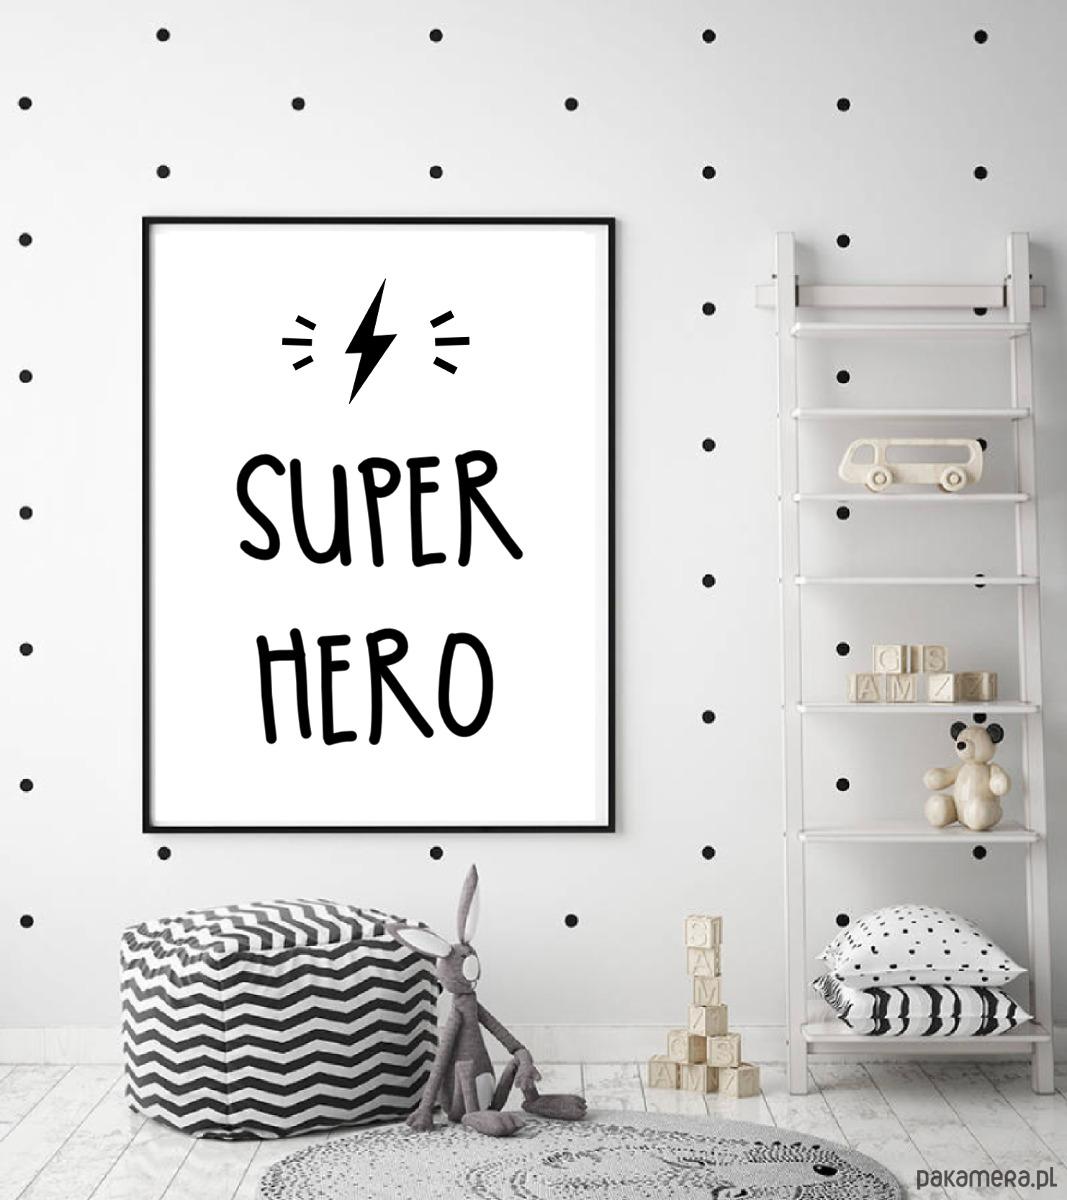 Plakat Do Pokoju Dziecka Dla Chłopca Super Hero Pakamerapl